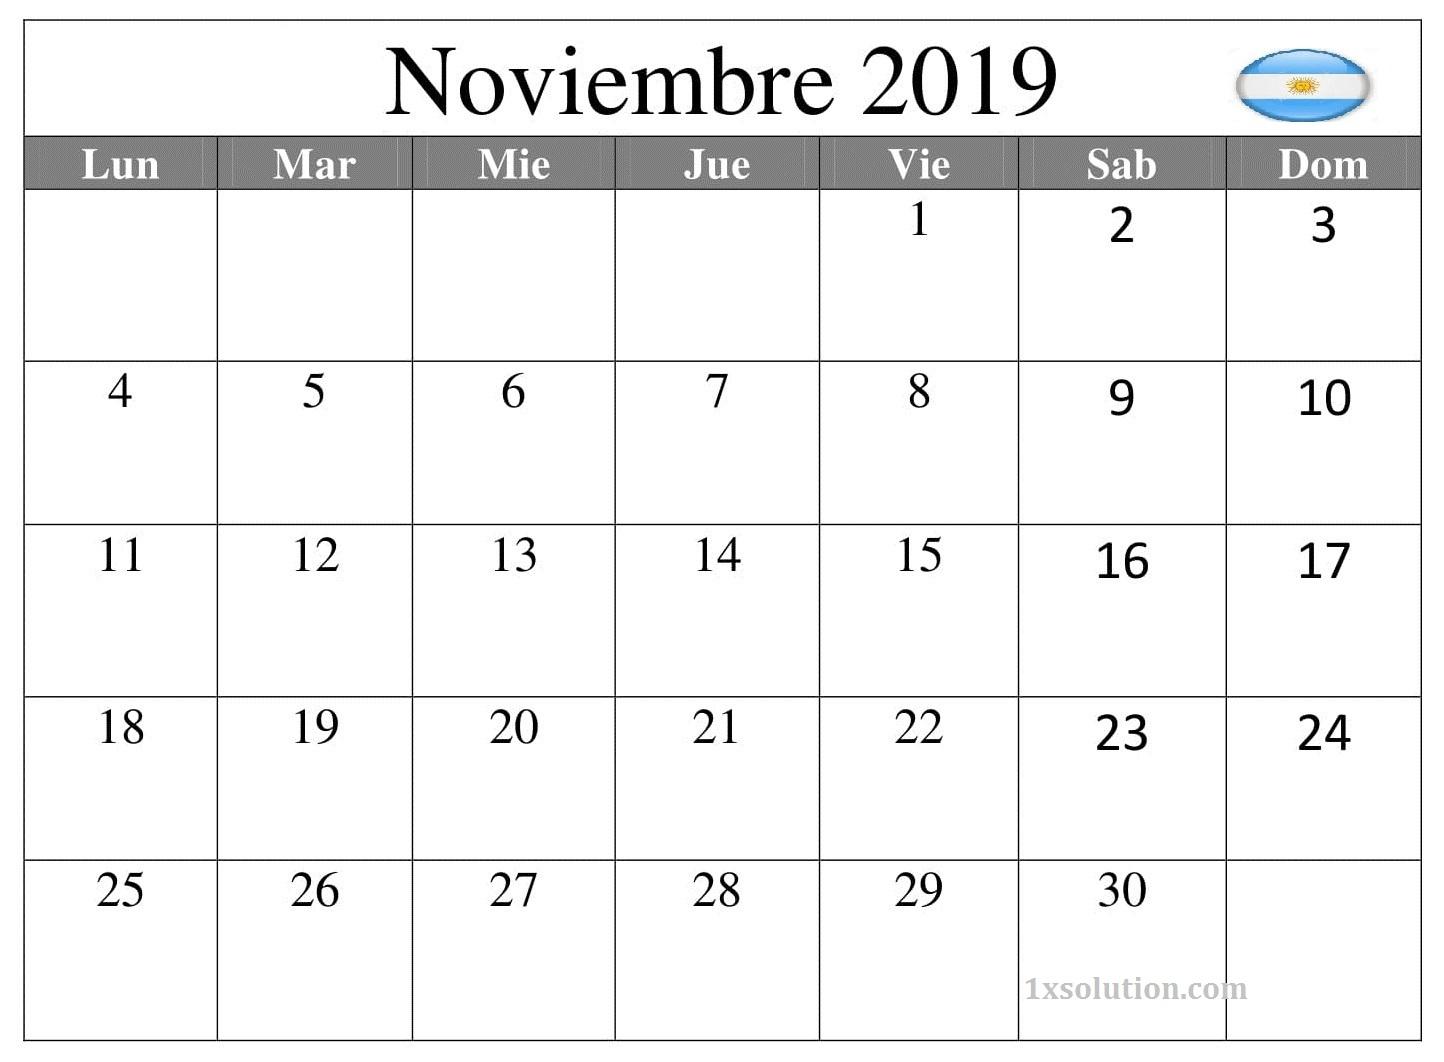 Calendario Noviembre 2019 Argentina Word